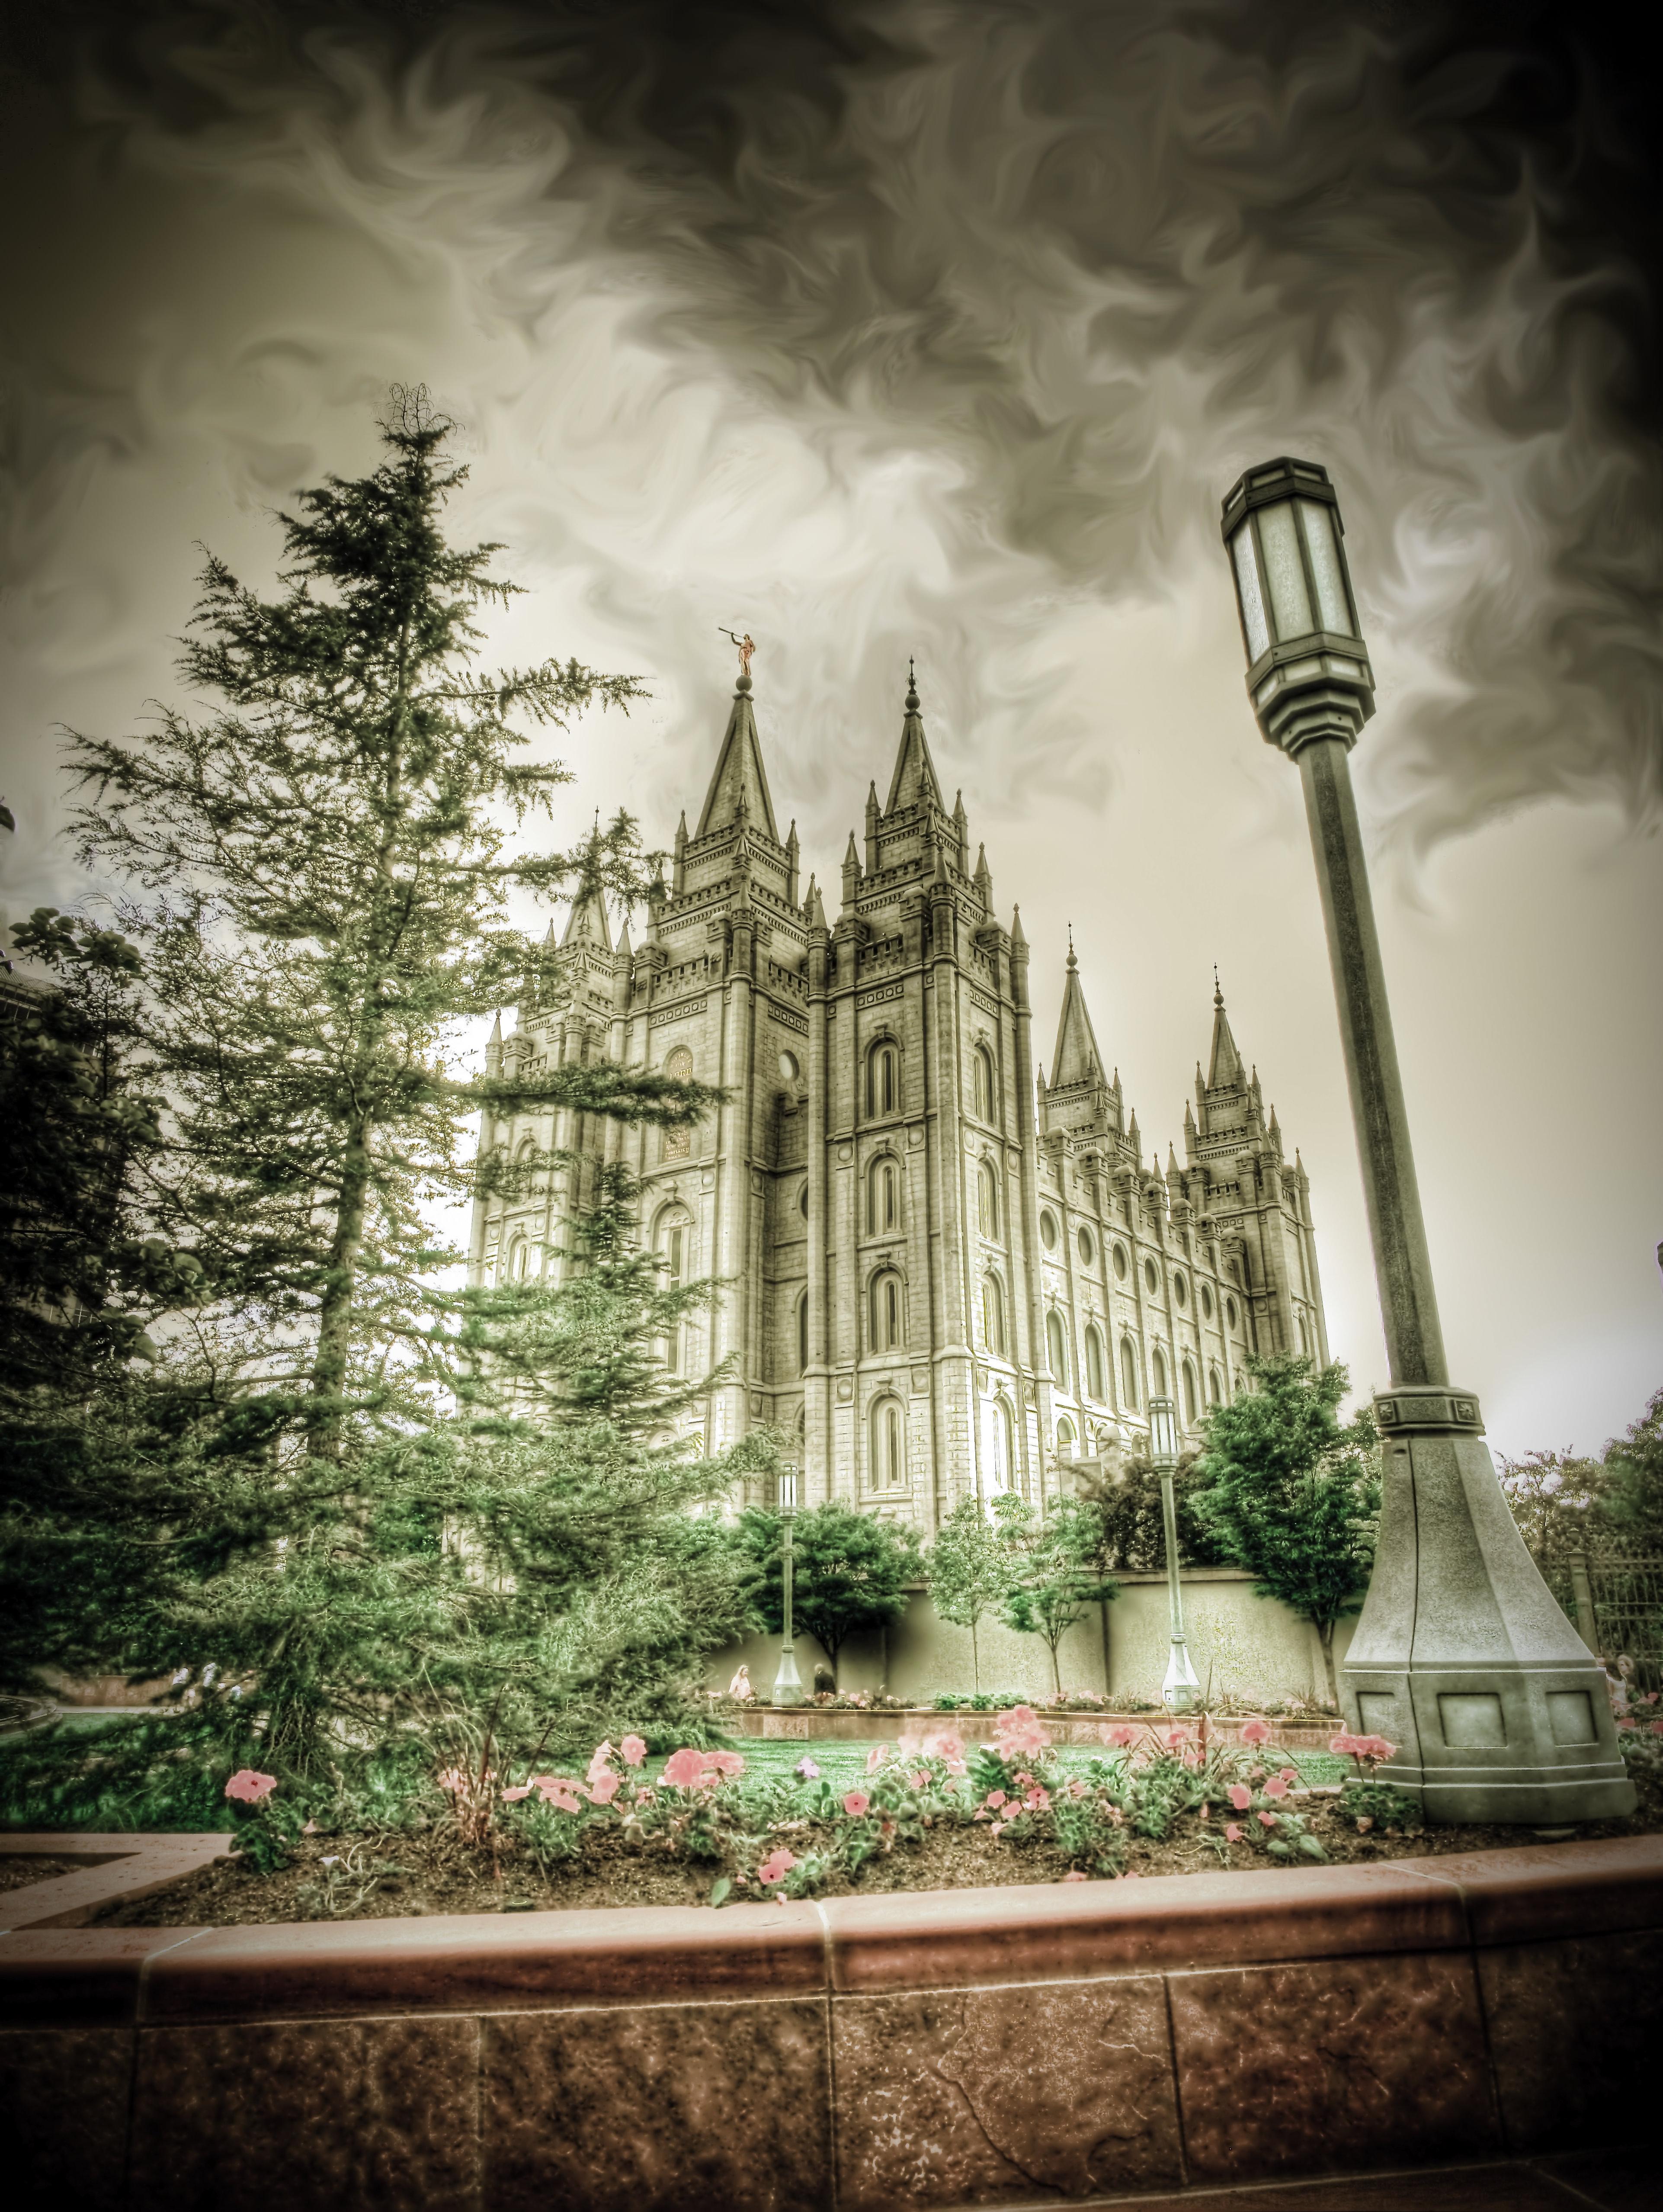 Salt Lake City - Dreamscape